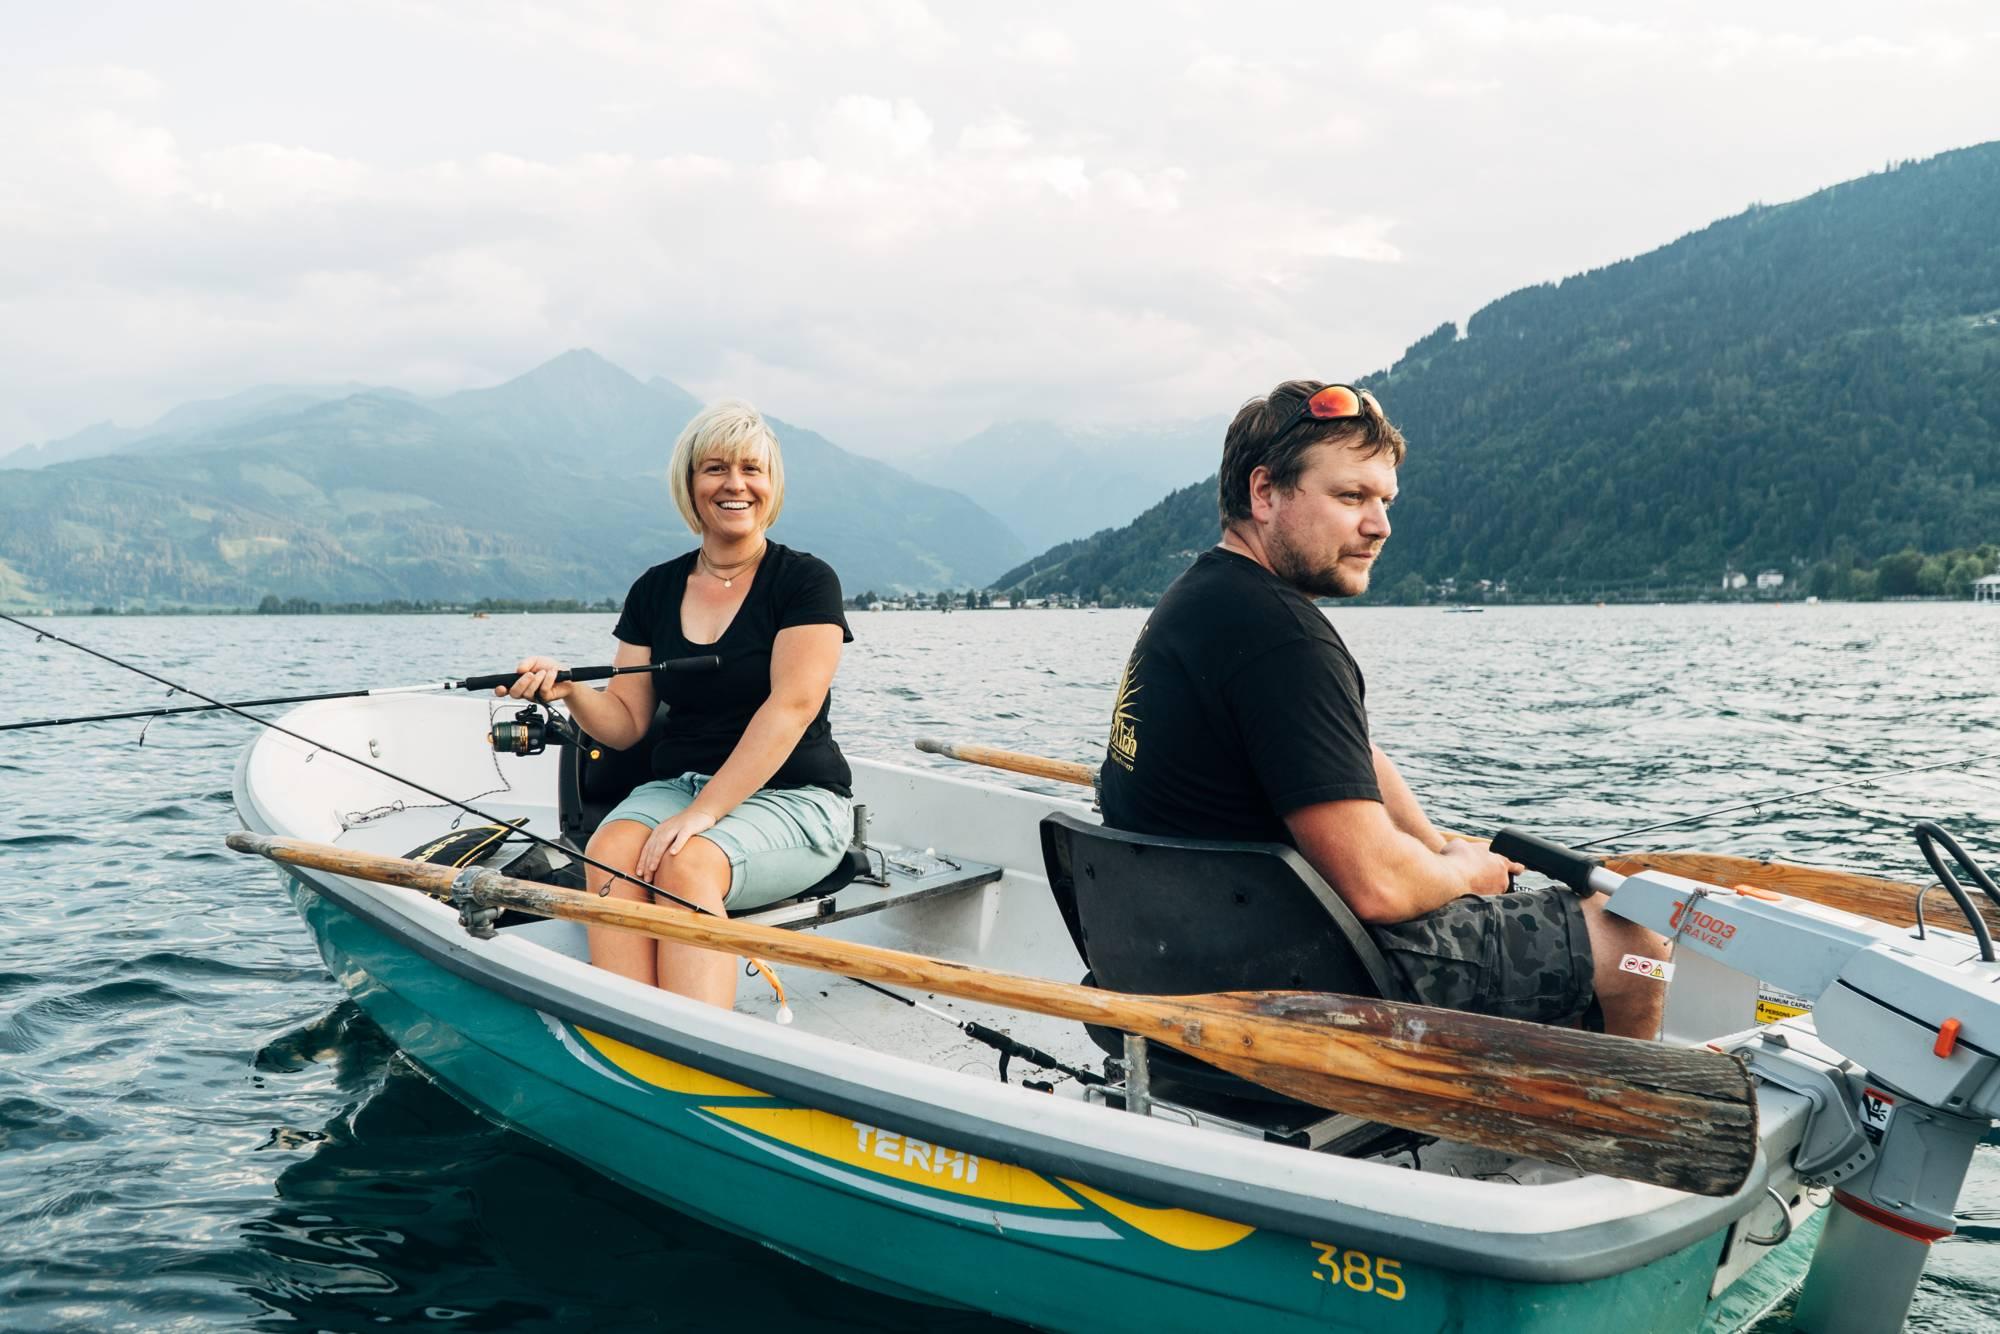 Fishing together on Lake Zell